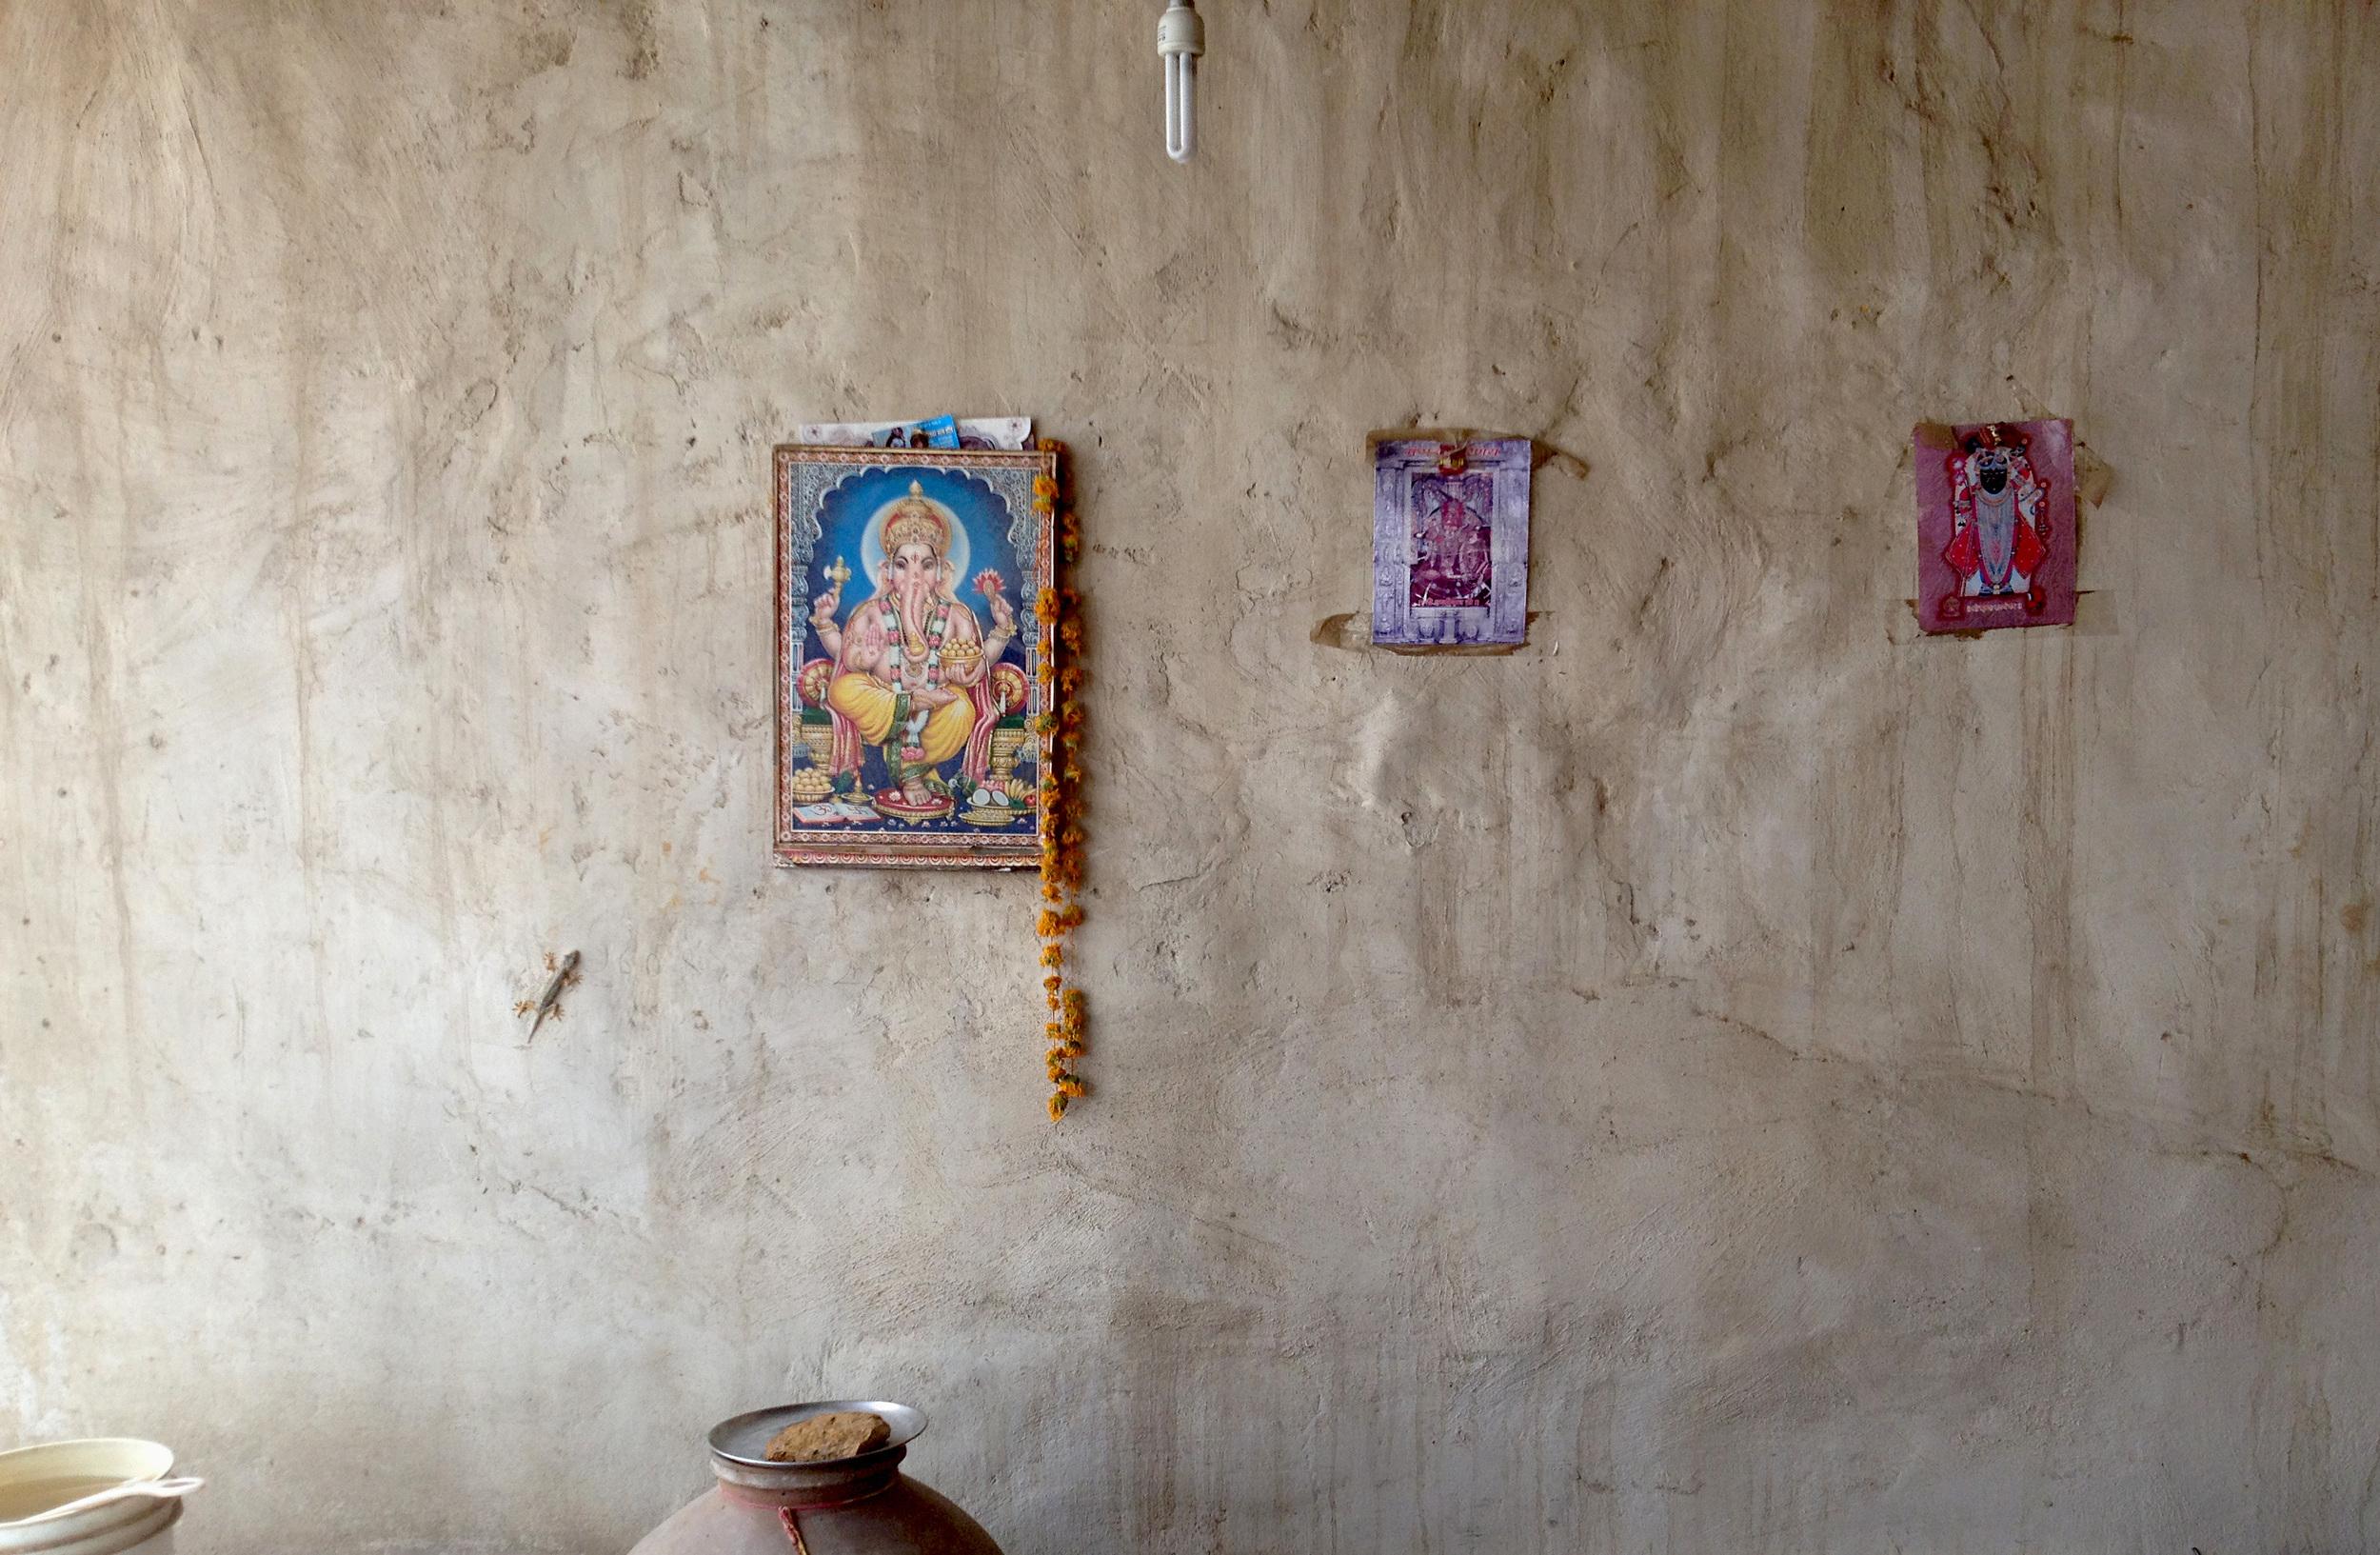 Shop in Jaisalmer, India